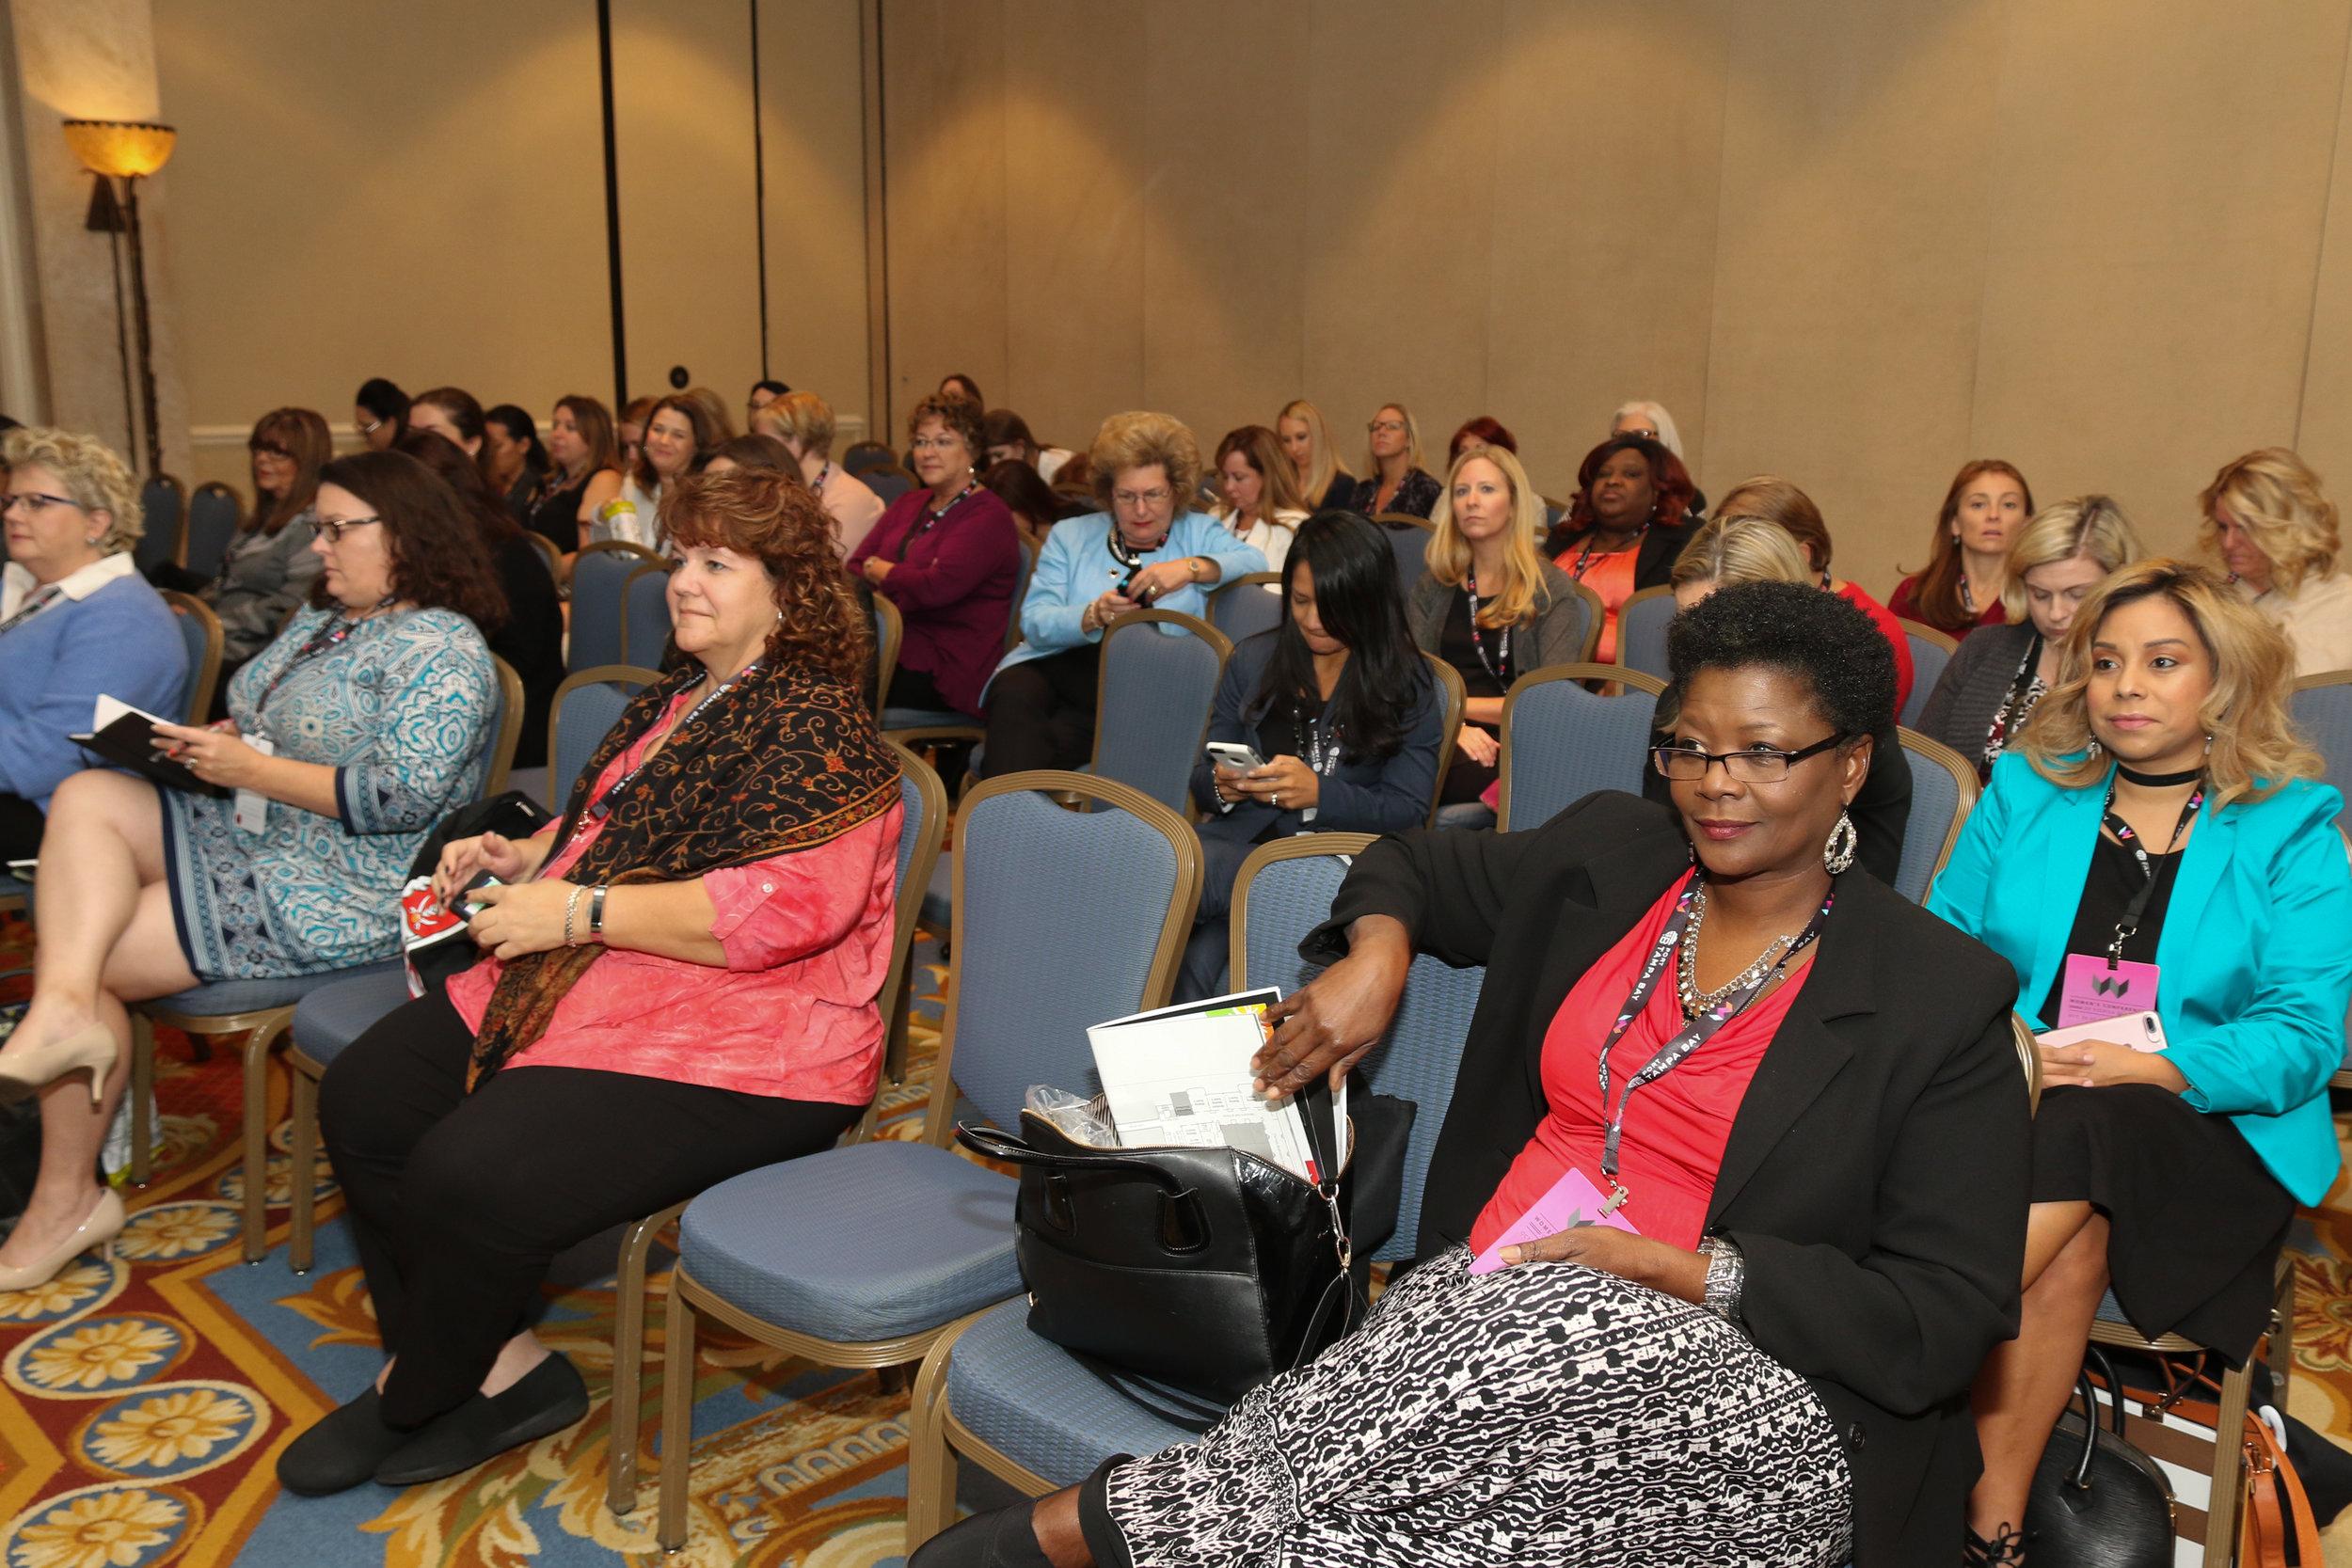 235_WomensConference_10-26-17.jpg